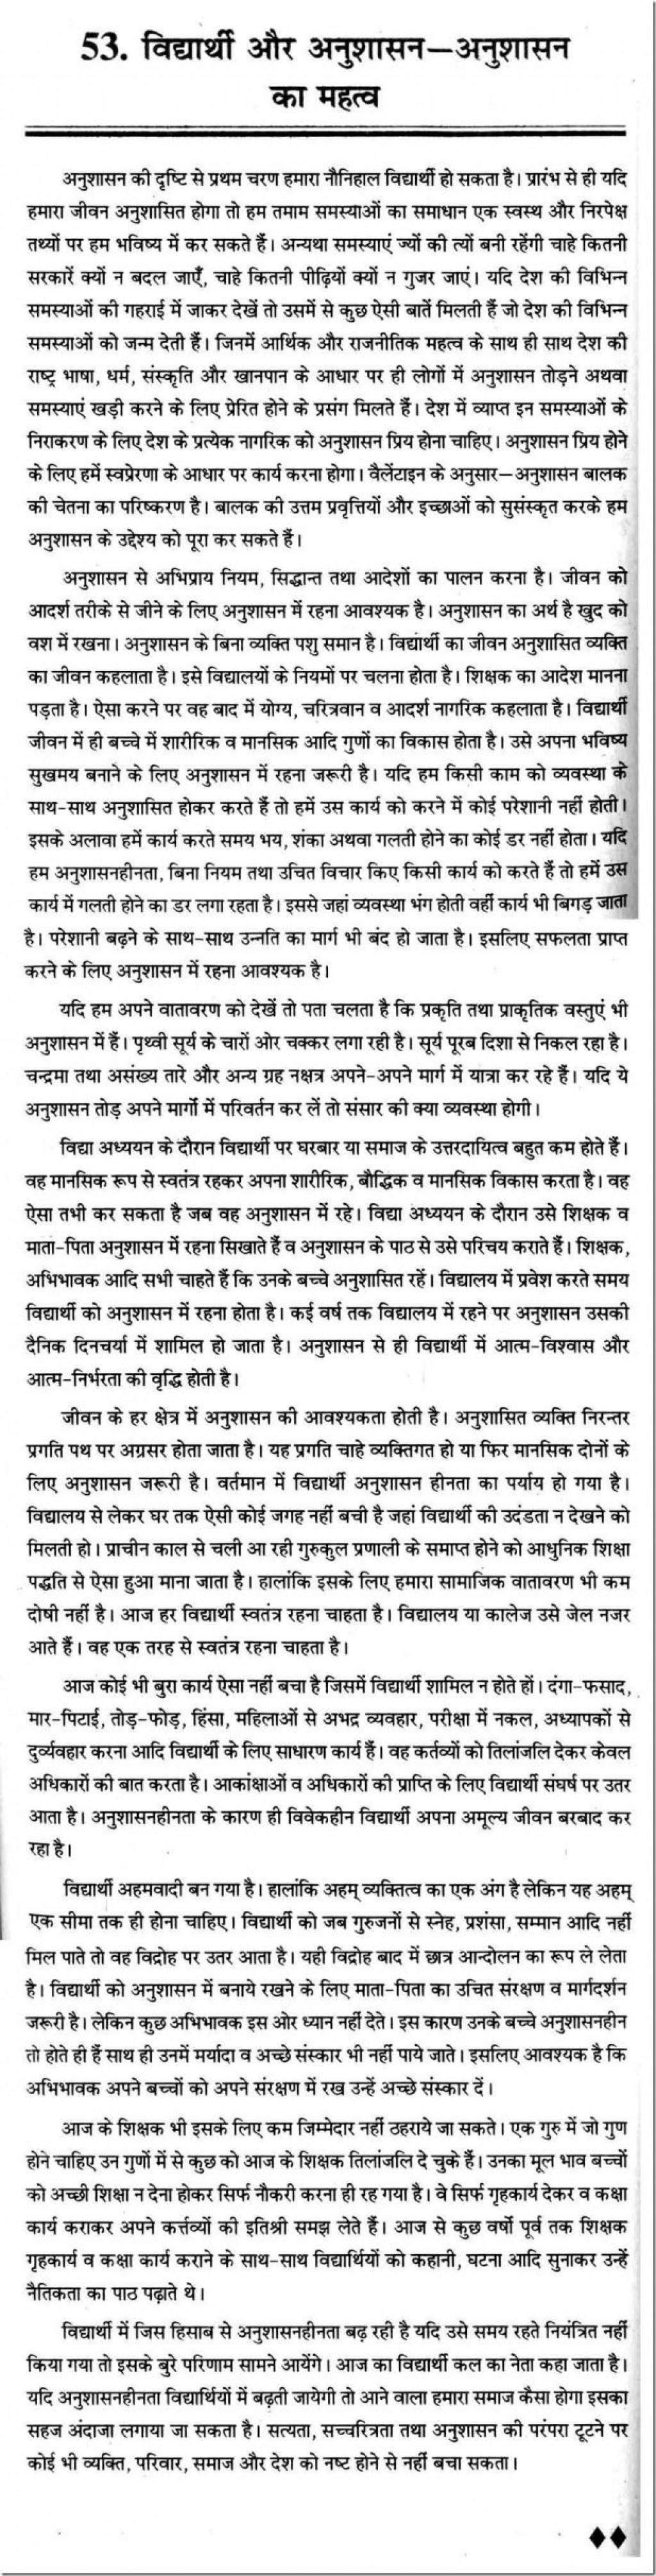 008 Studentife Essay Thumb In Nepali Punjabi Person Technology Collegeanguage Topics Hindi For Of Athlete Sanskrit Kannada Pdf English Class 618x2426 Example Importance Best College Life On Discipline Large